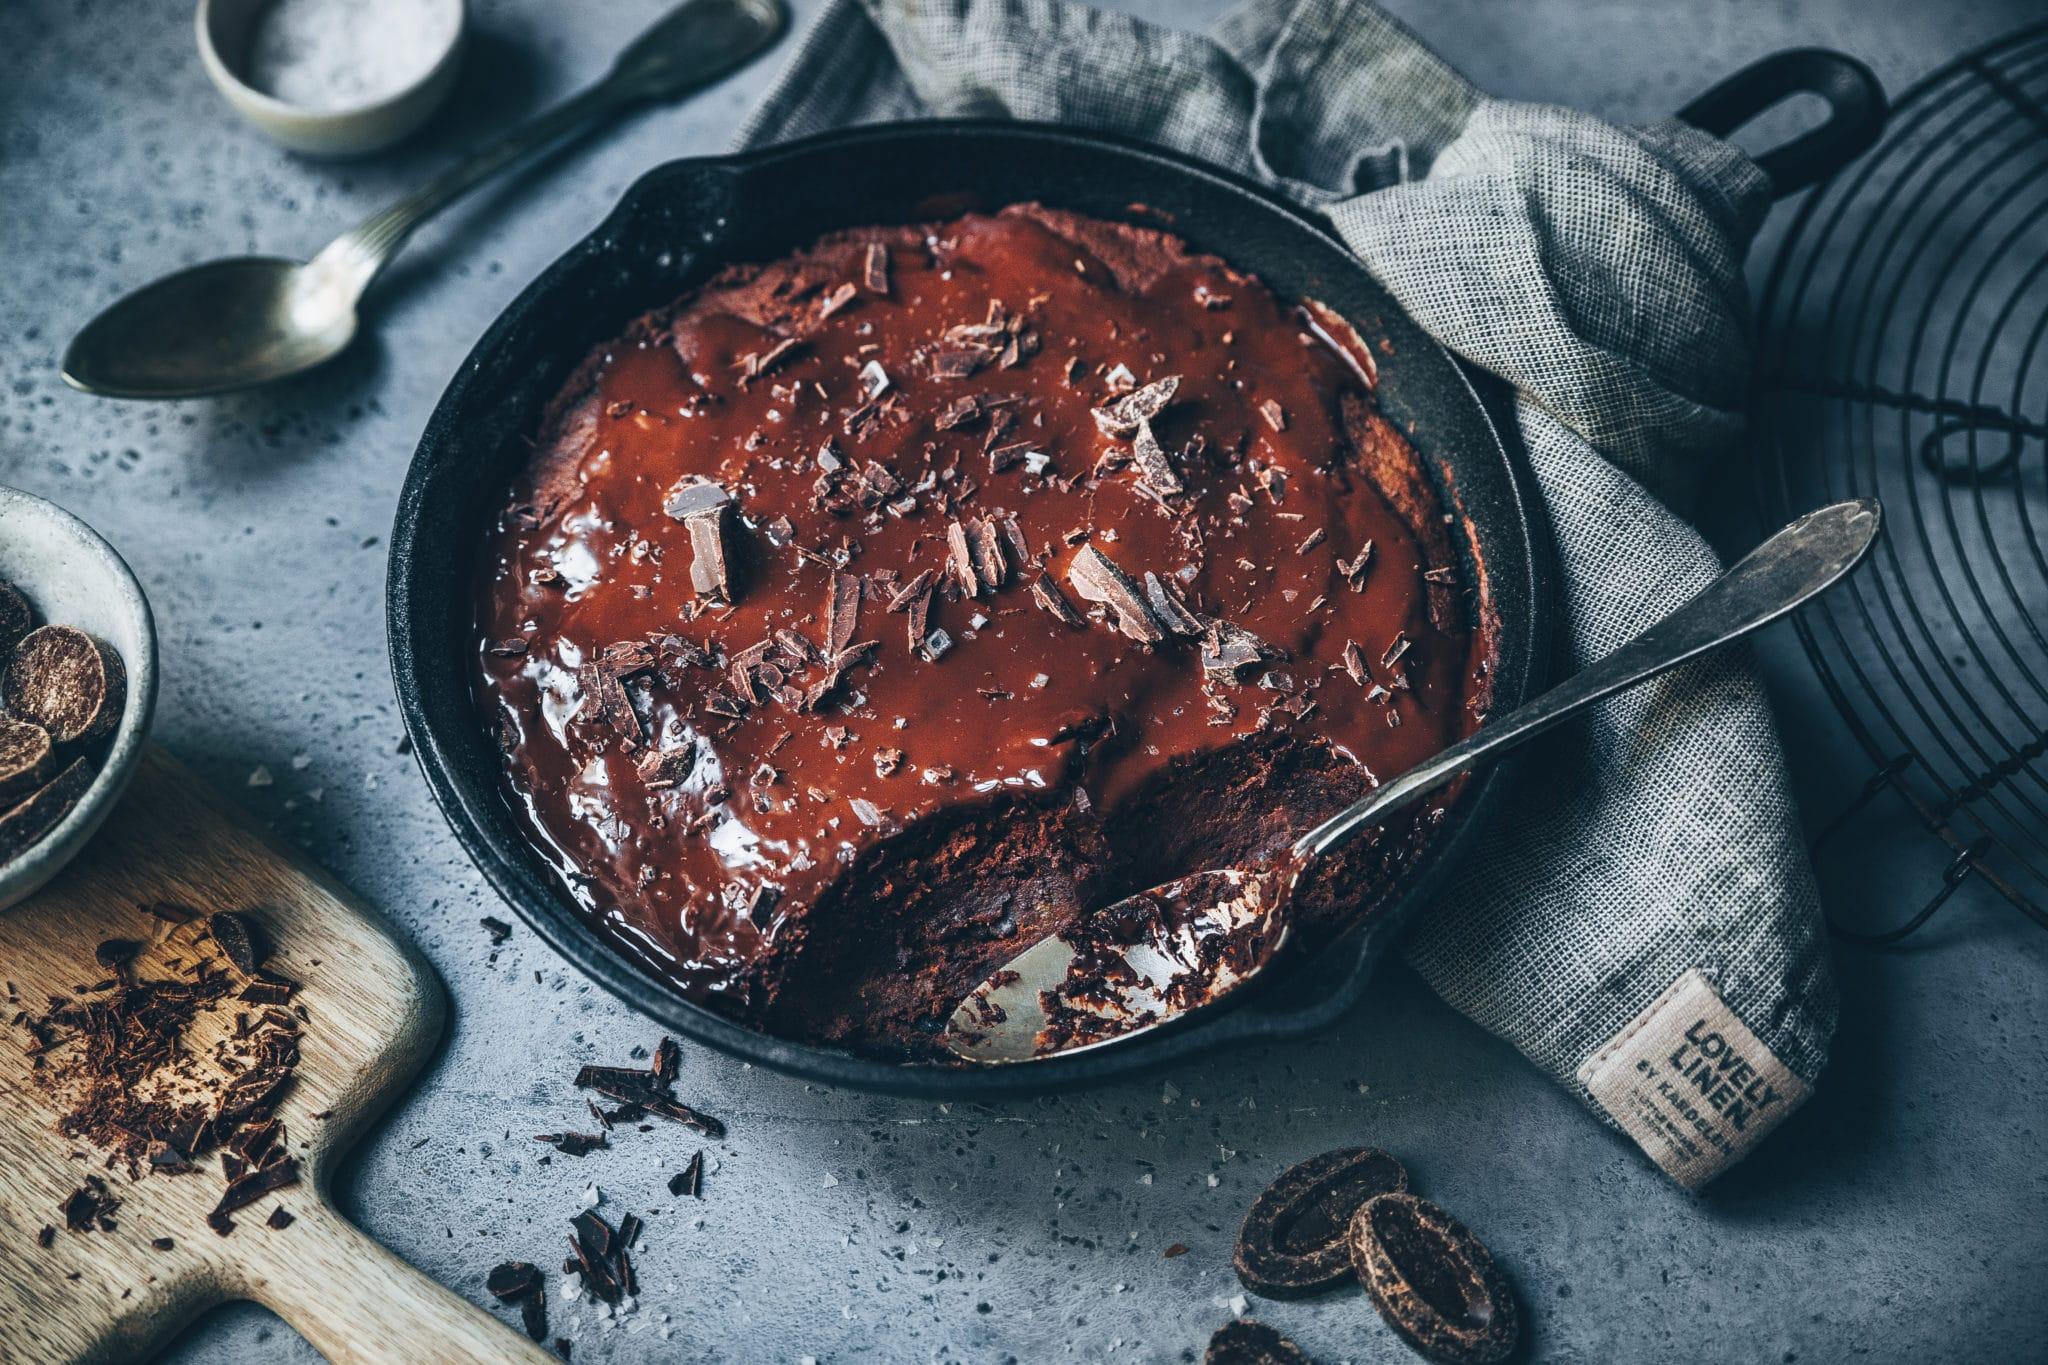 Brownie à la patate douce